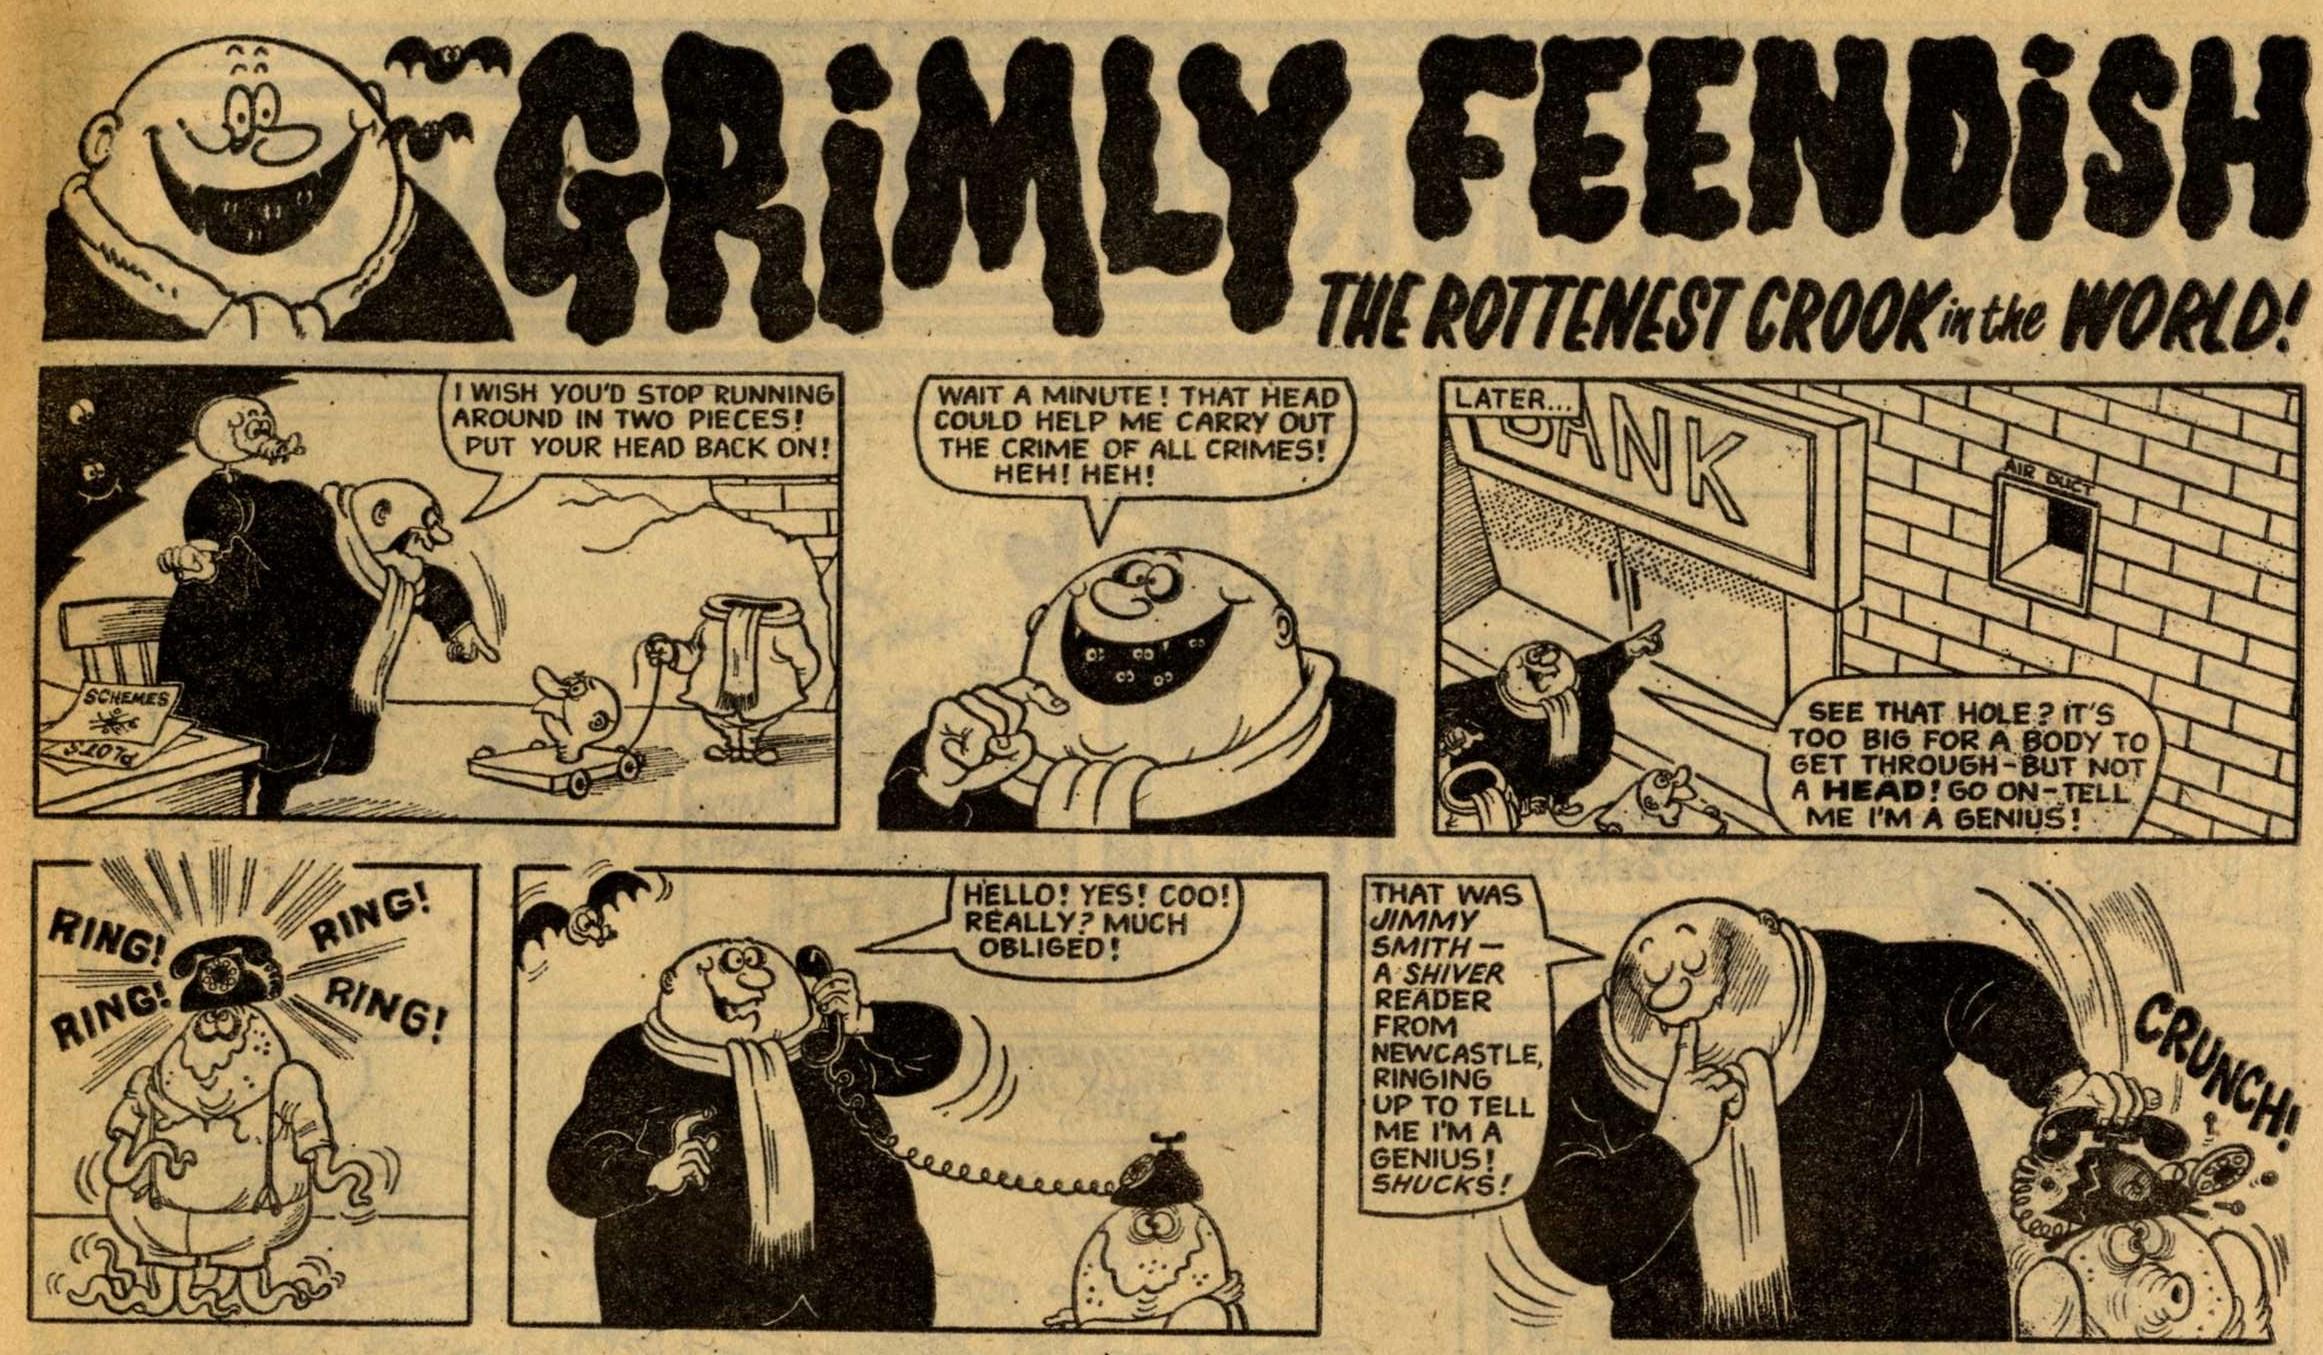 Grimly Feendish, drawn by Leo Baxendale